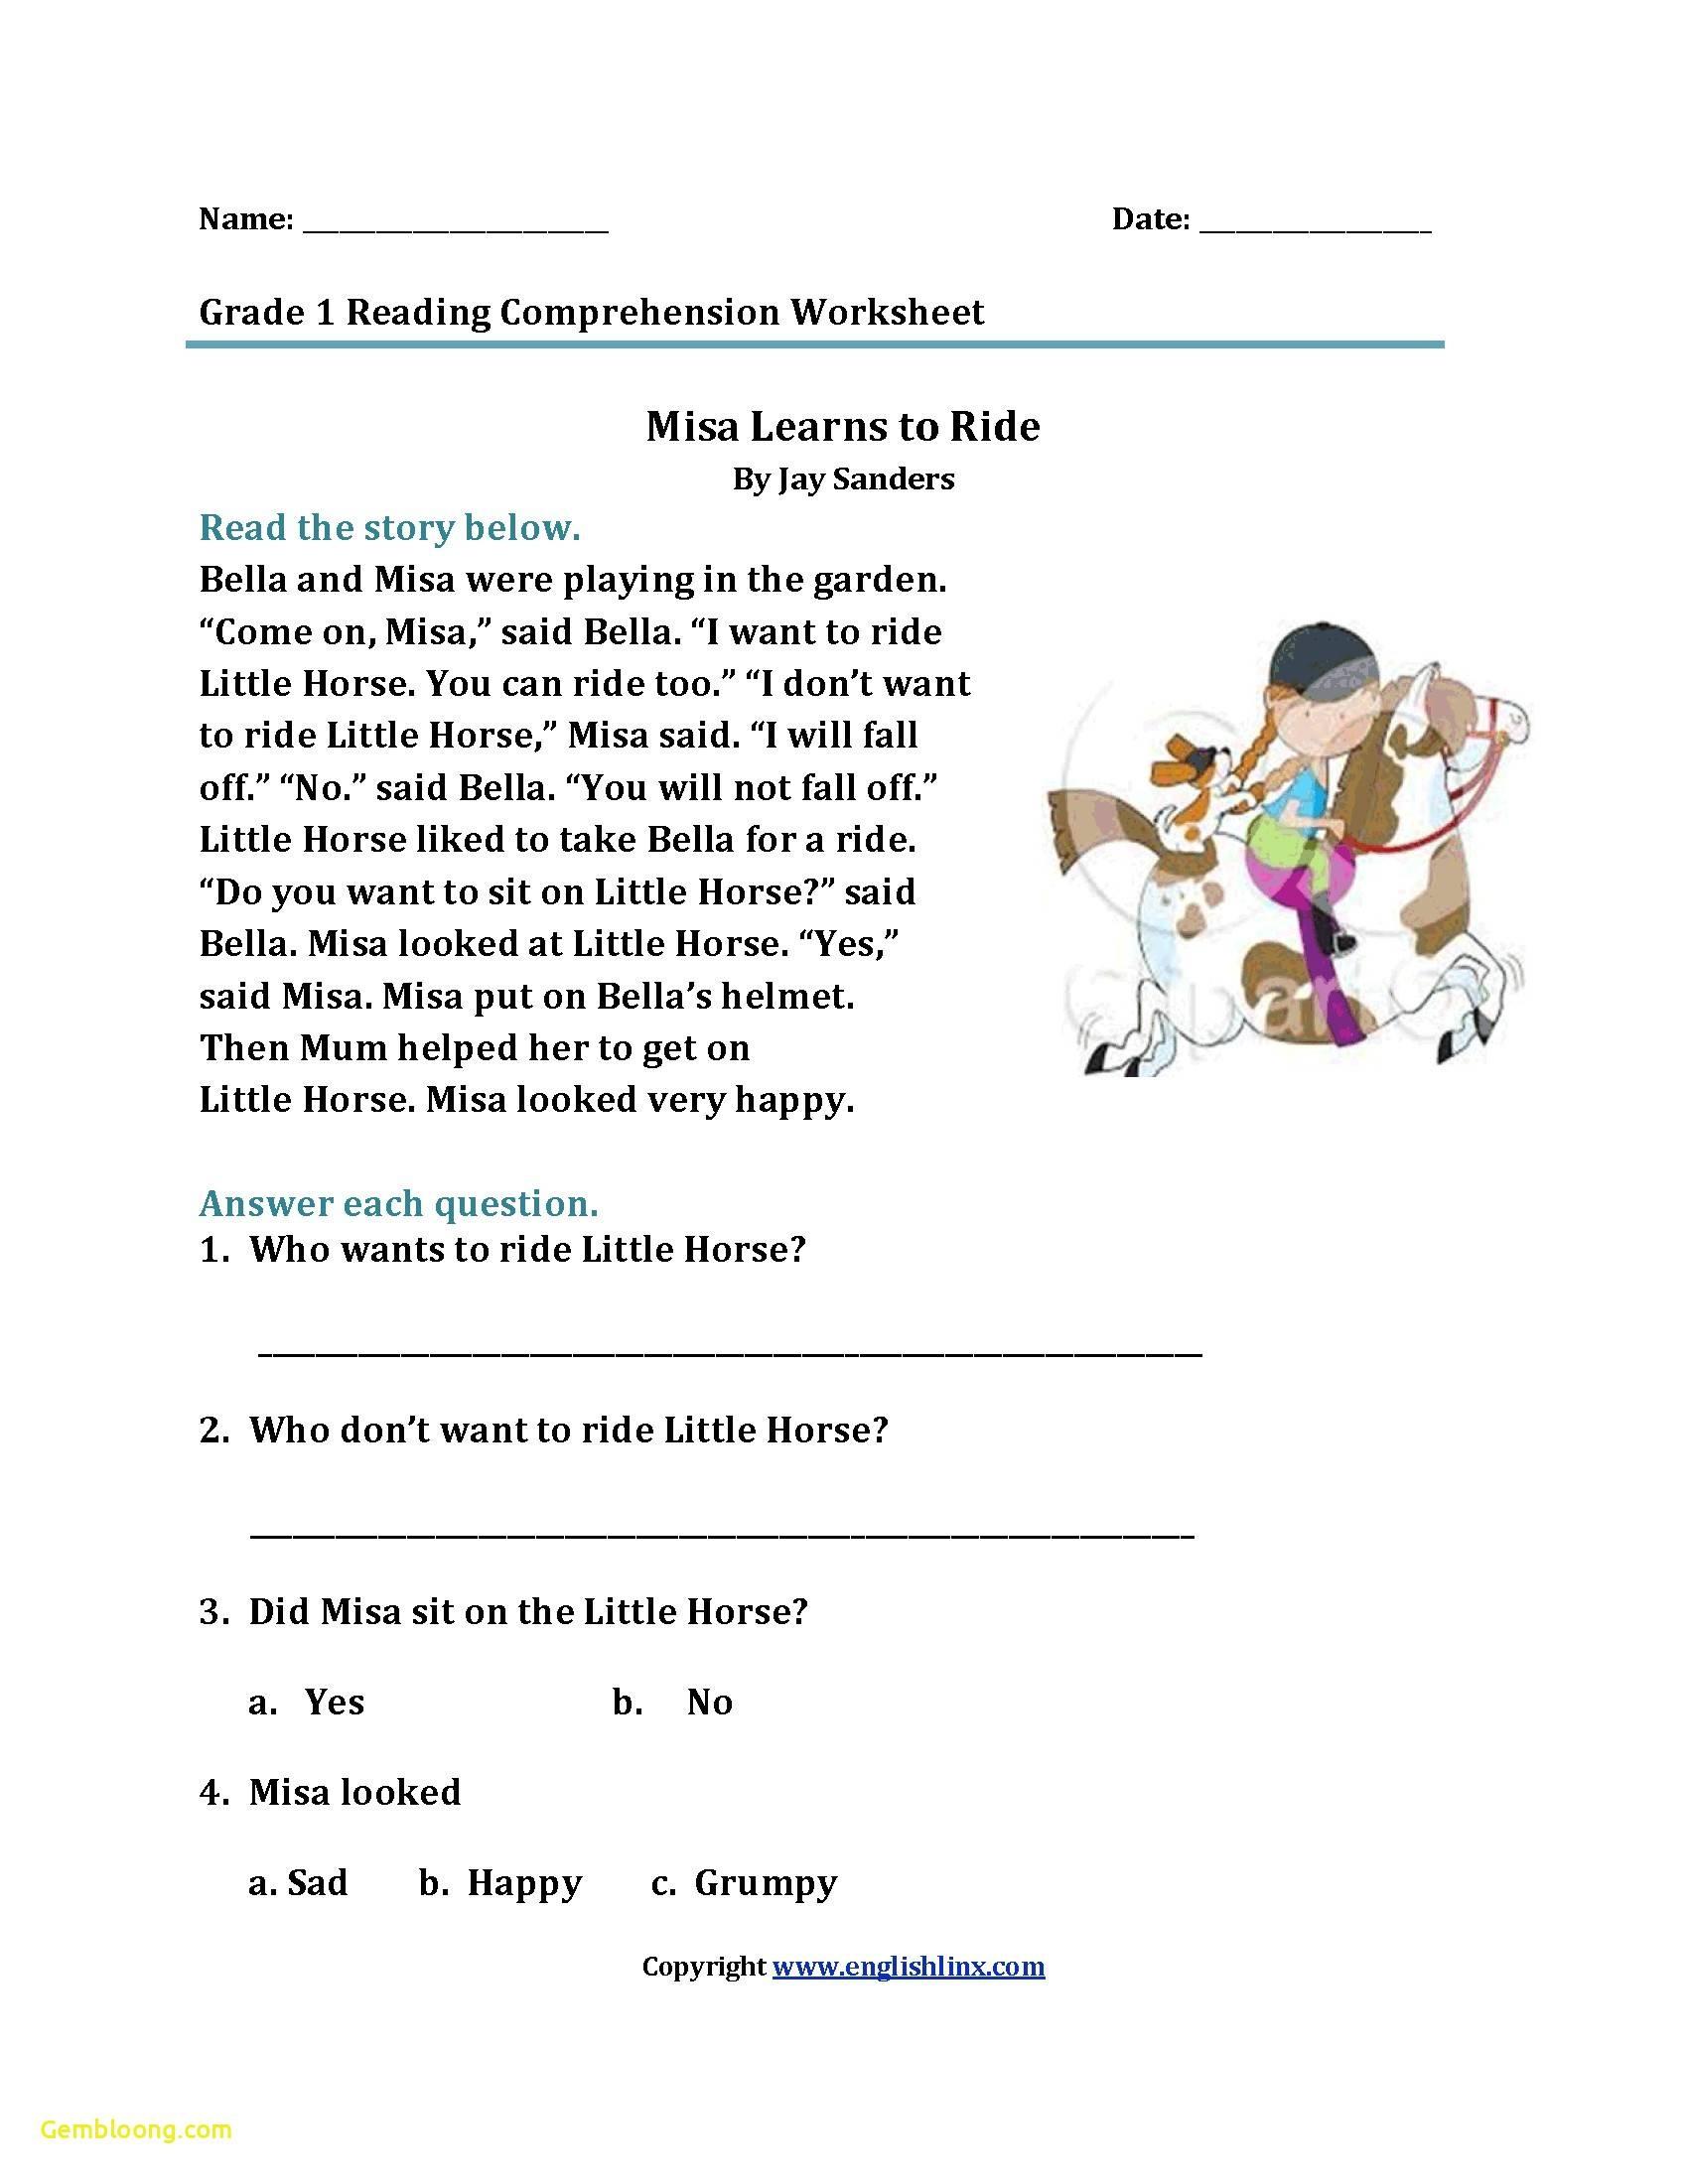 Reading Comprehension Worksheets For 1St Grade - Cramerforcongress - Free Printable Grade 1 Reading Comprehension Worksheets